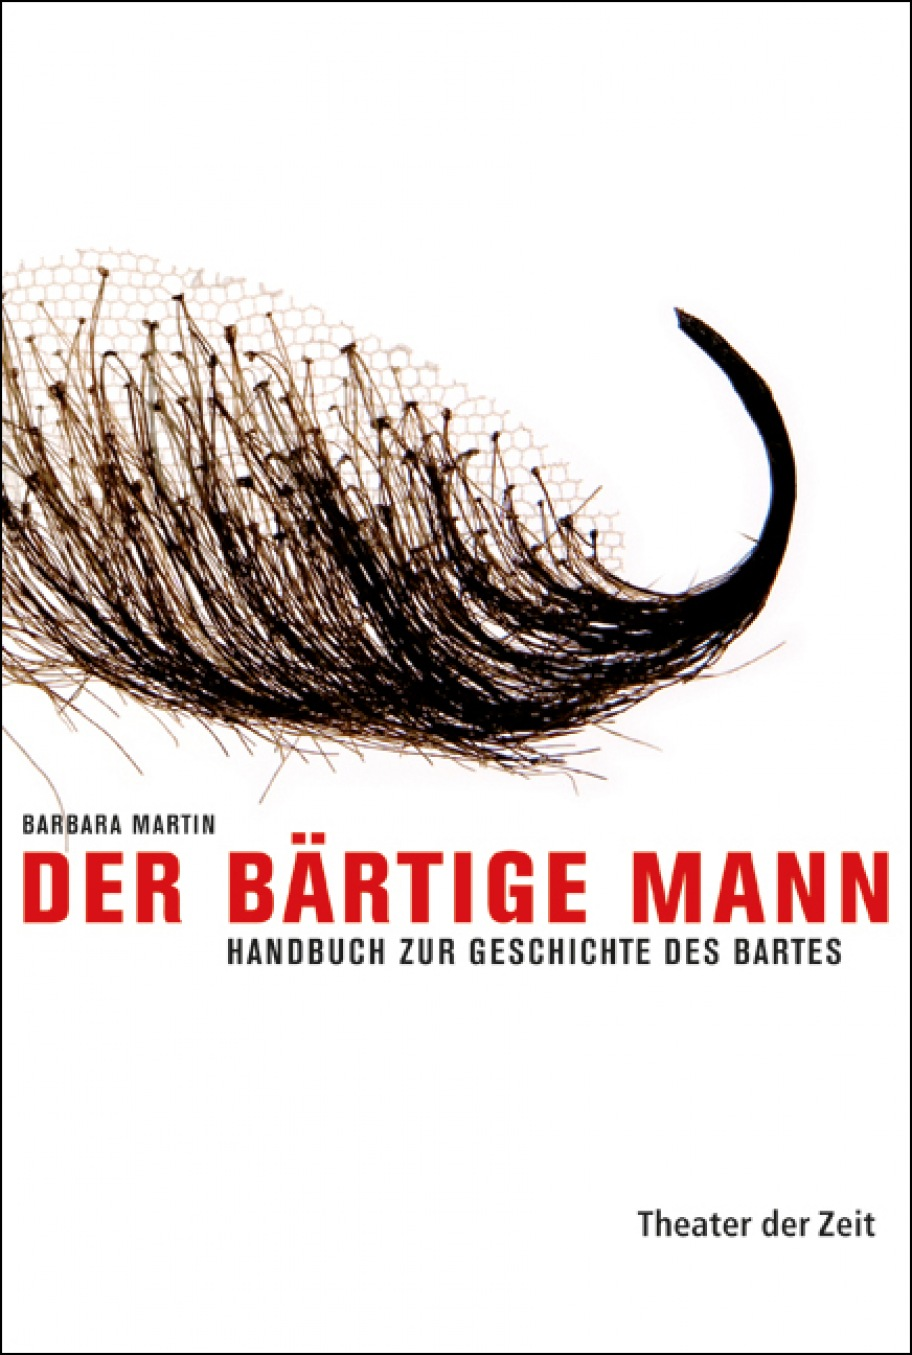 Barbara Martin: Der bärtige Mann